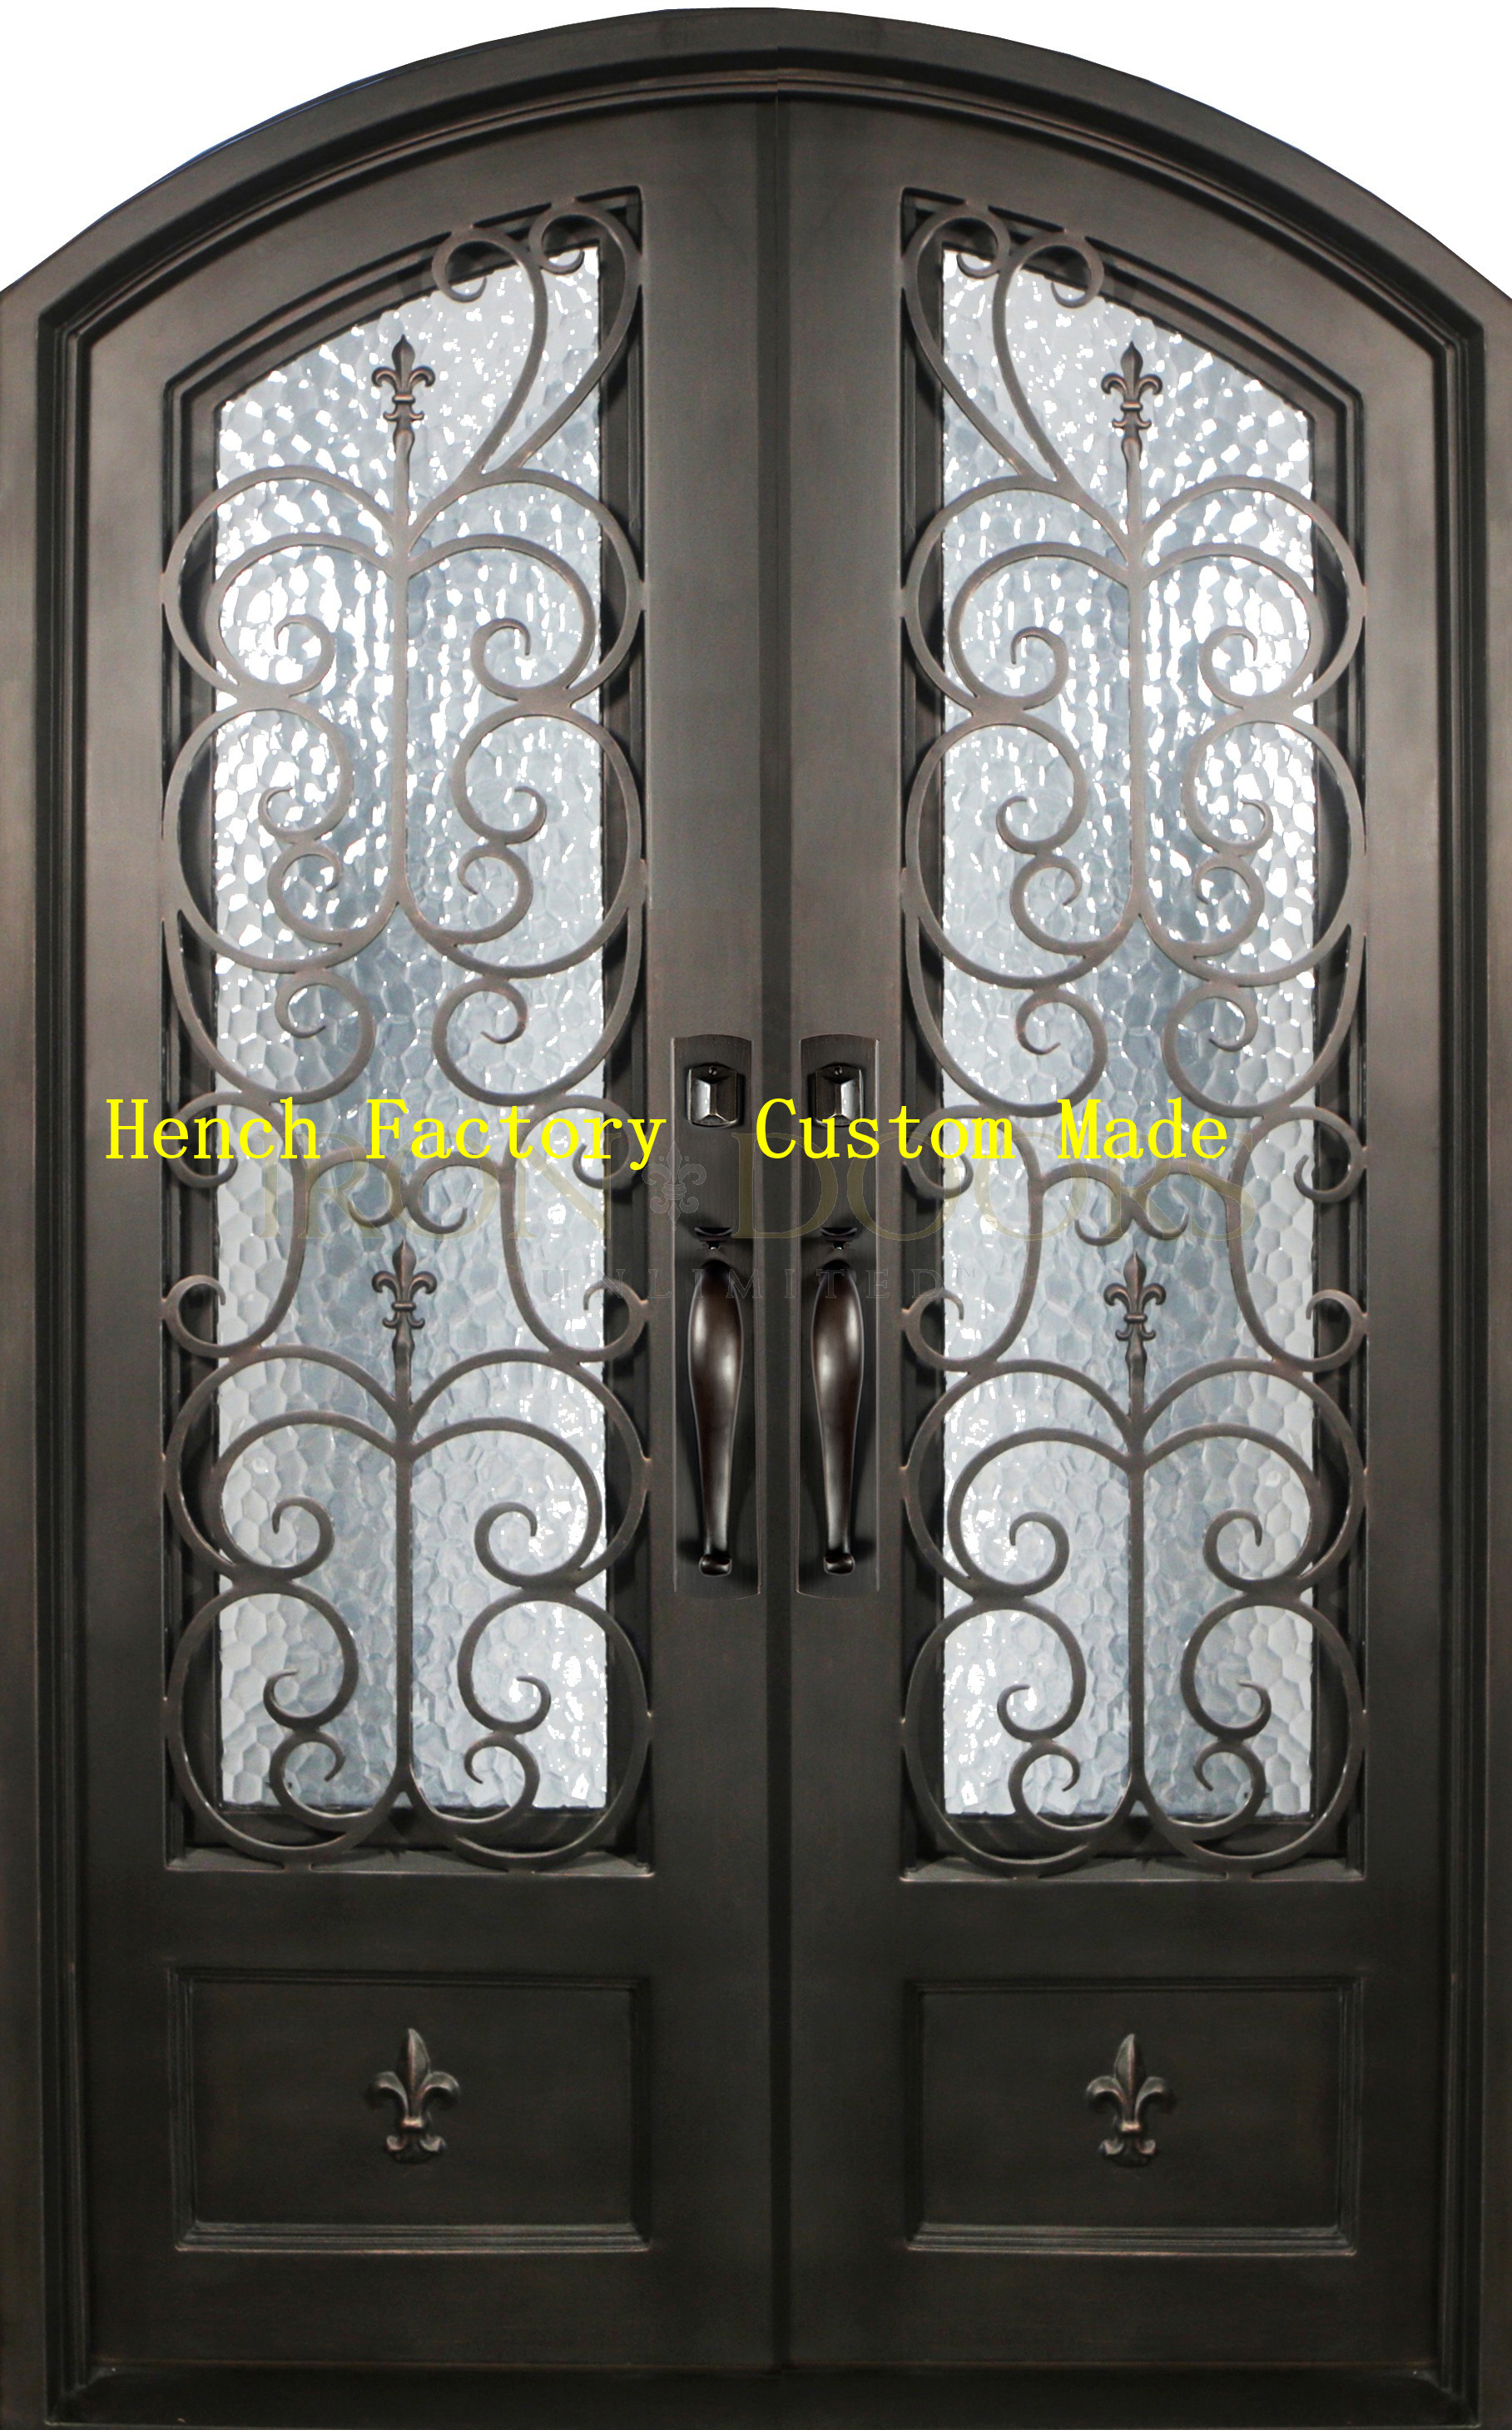 Shanghai Hench Brand China Factory 100% Custom Made Sale Australia Residential Iron Doors